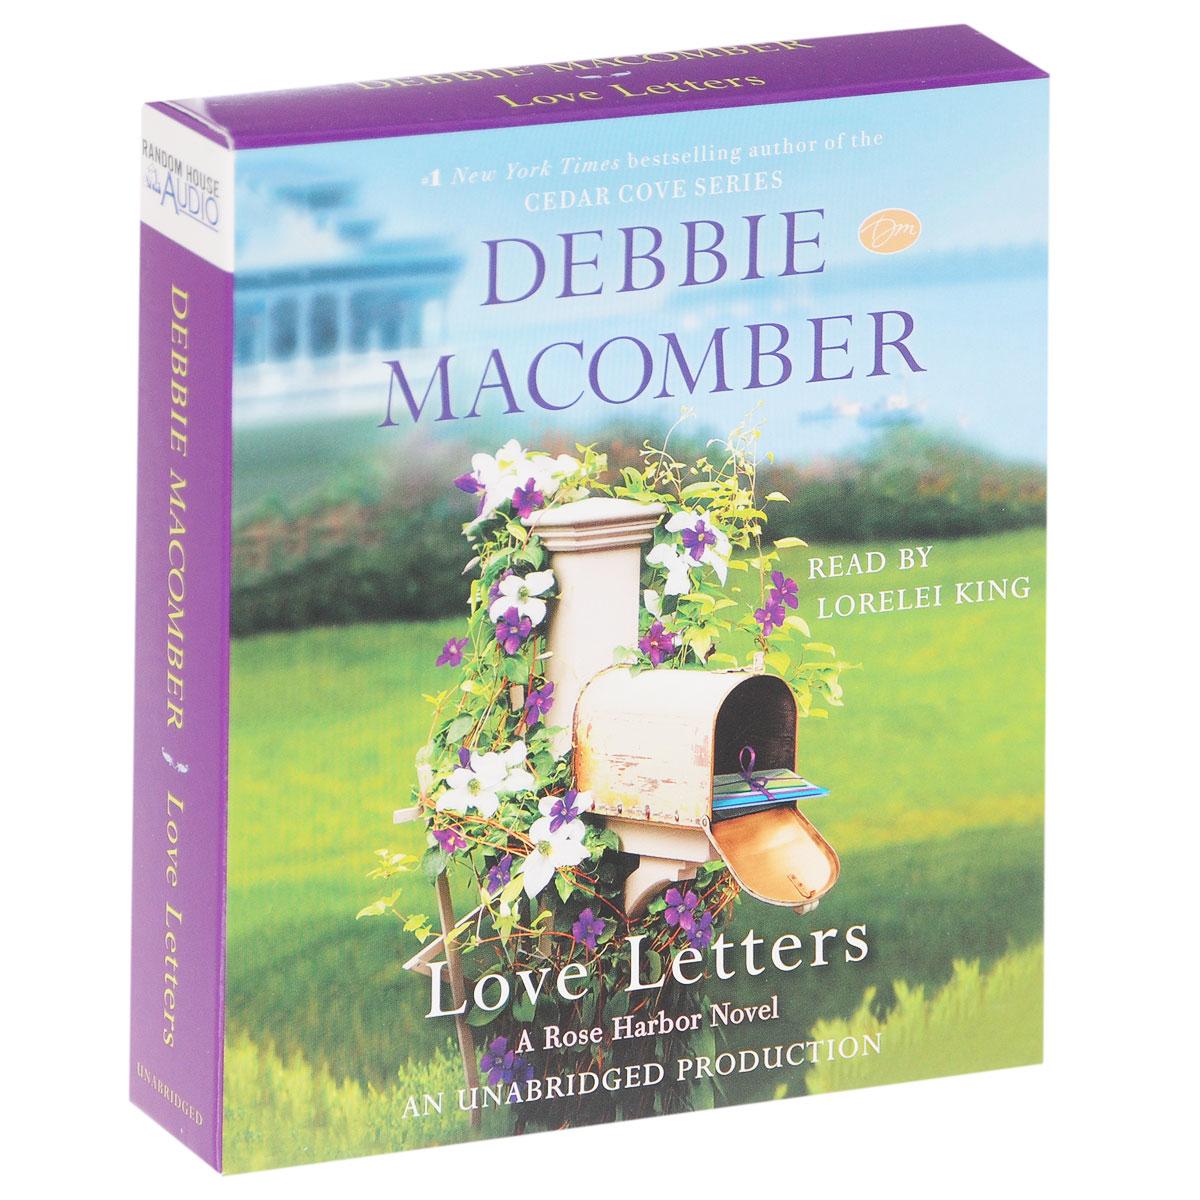 Love Letters (аудиокнига на 9 CD)